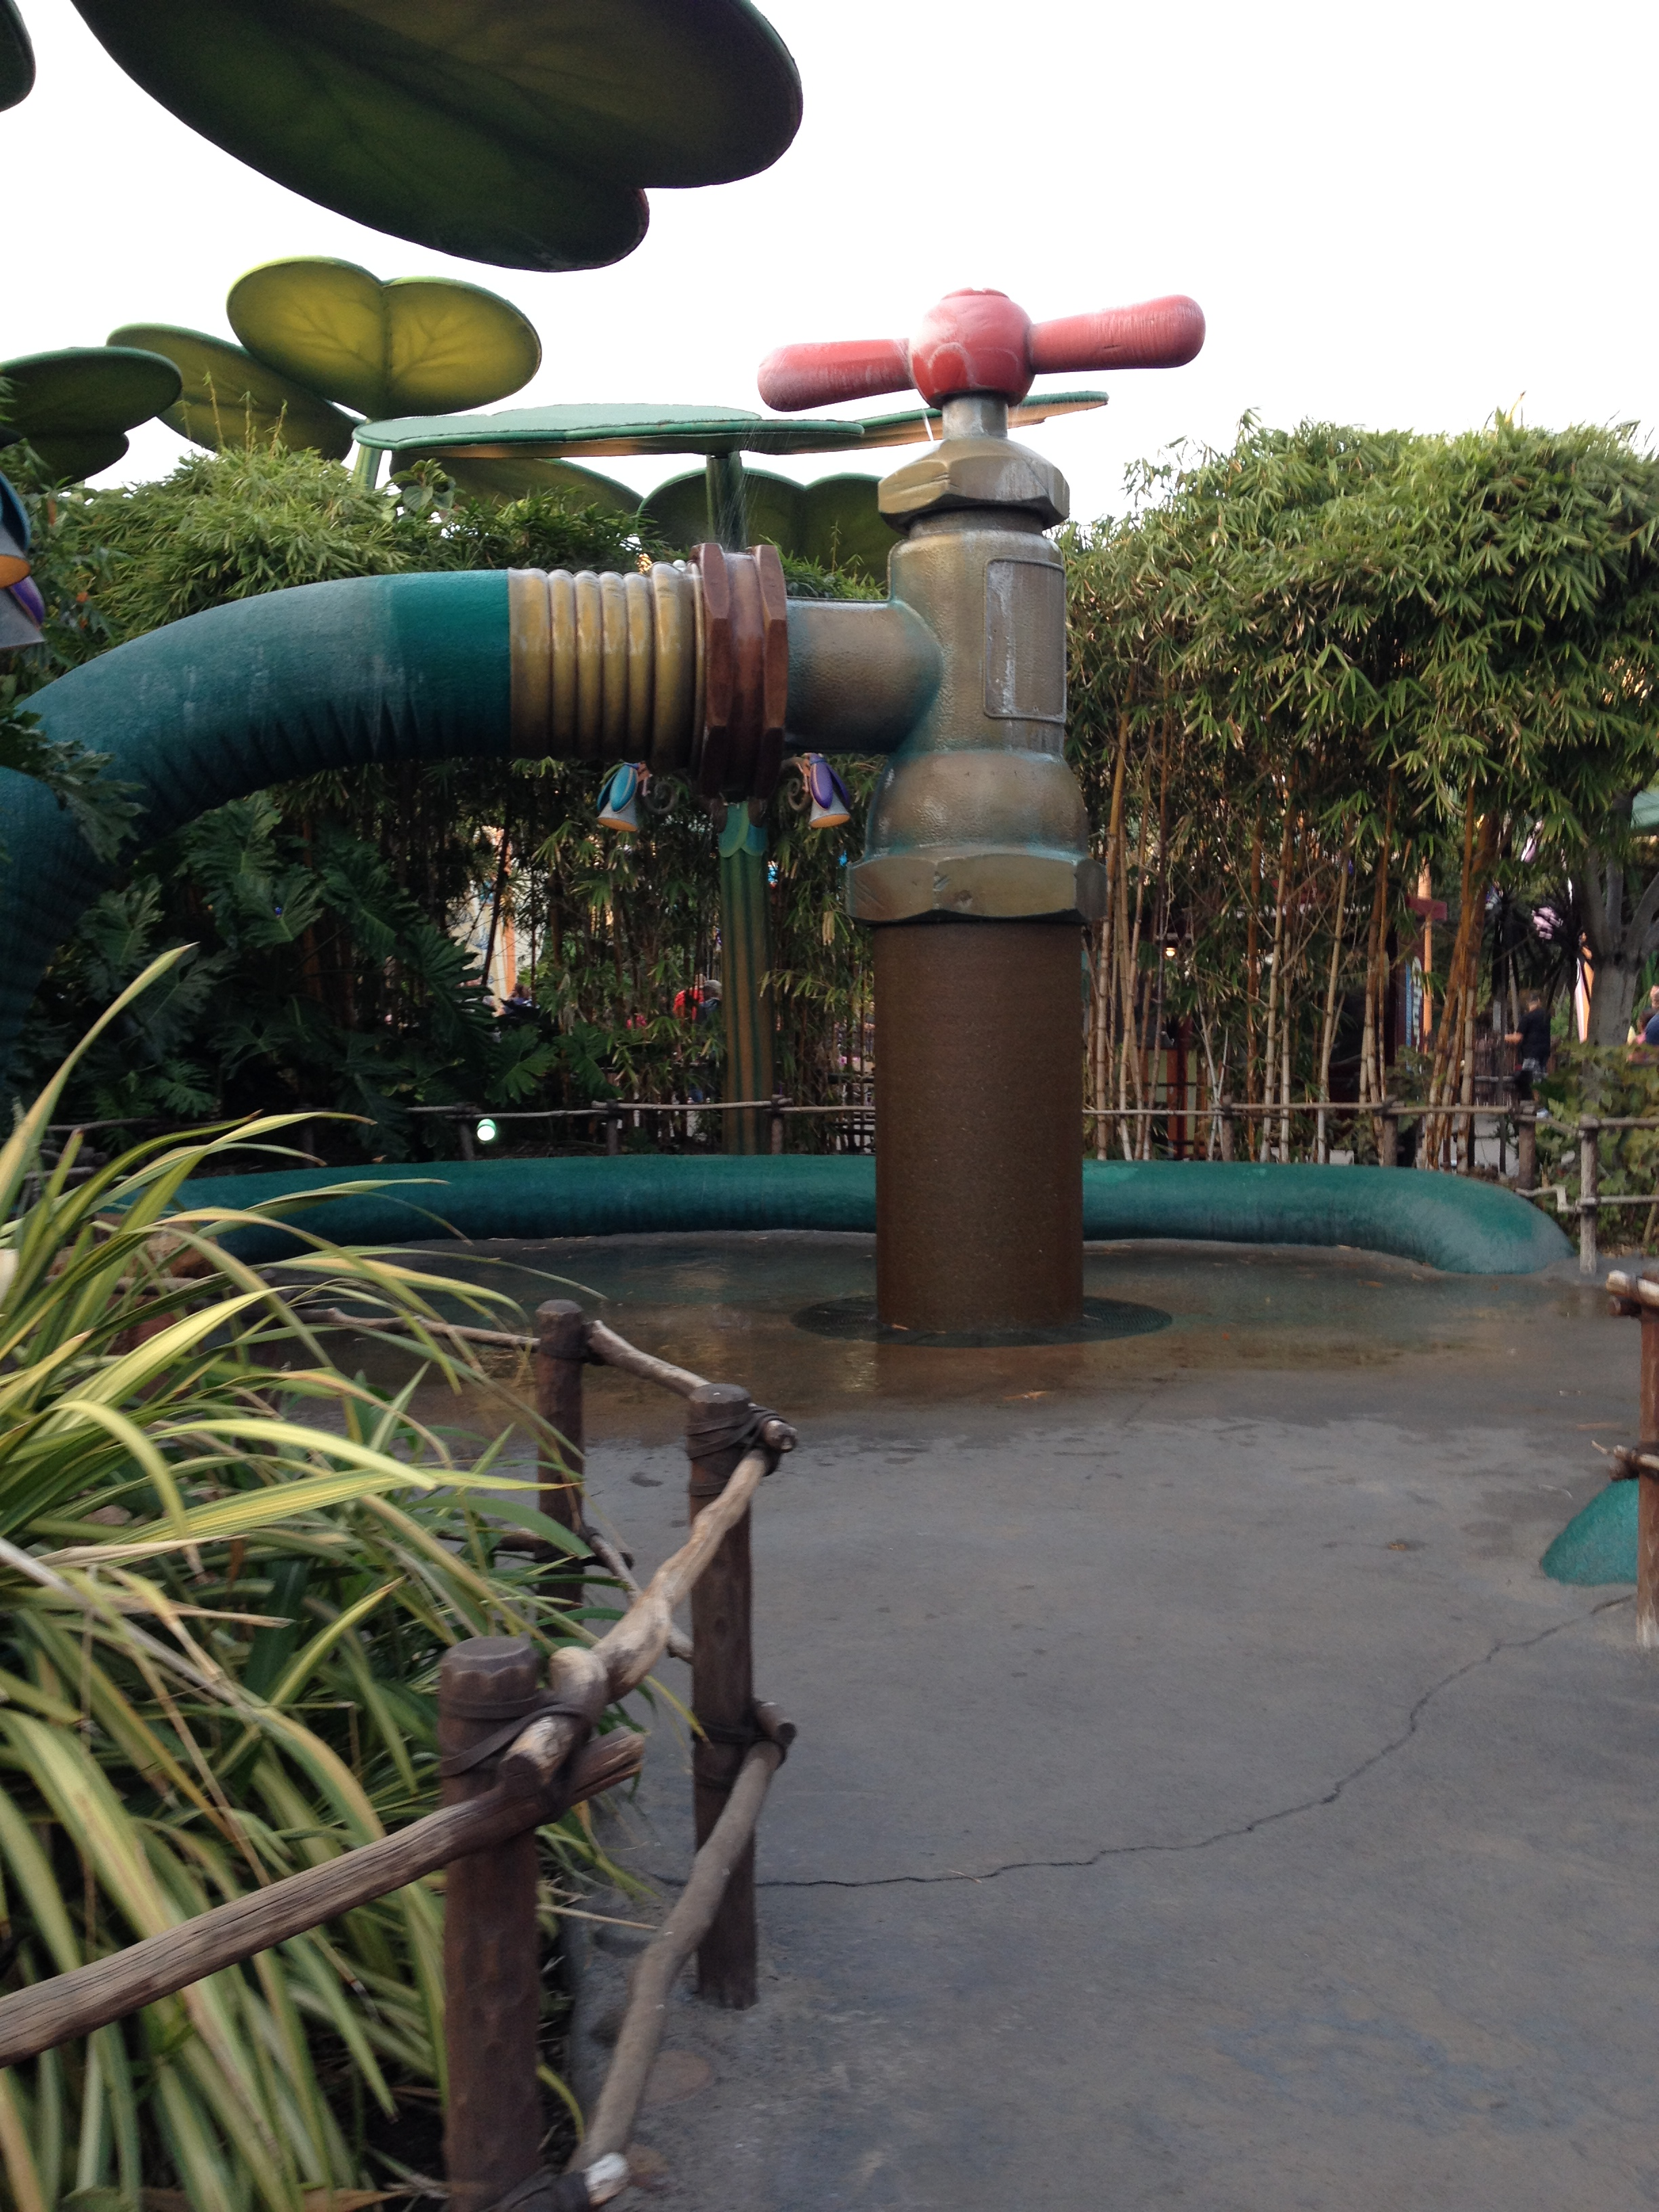 Beat the Heat Disneyland Style!